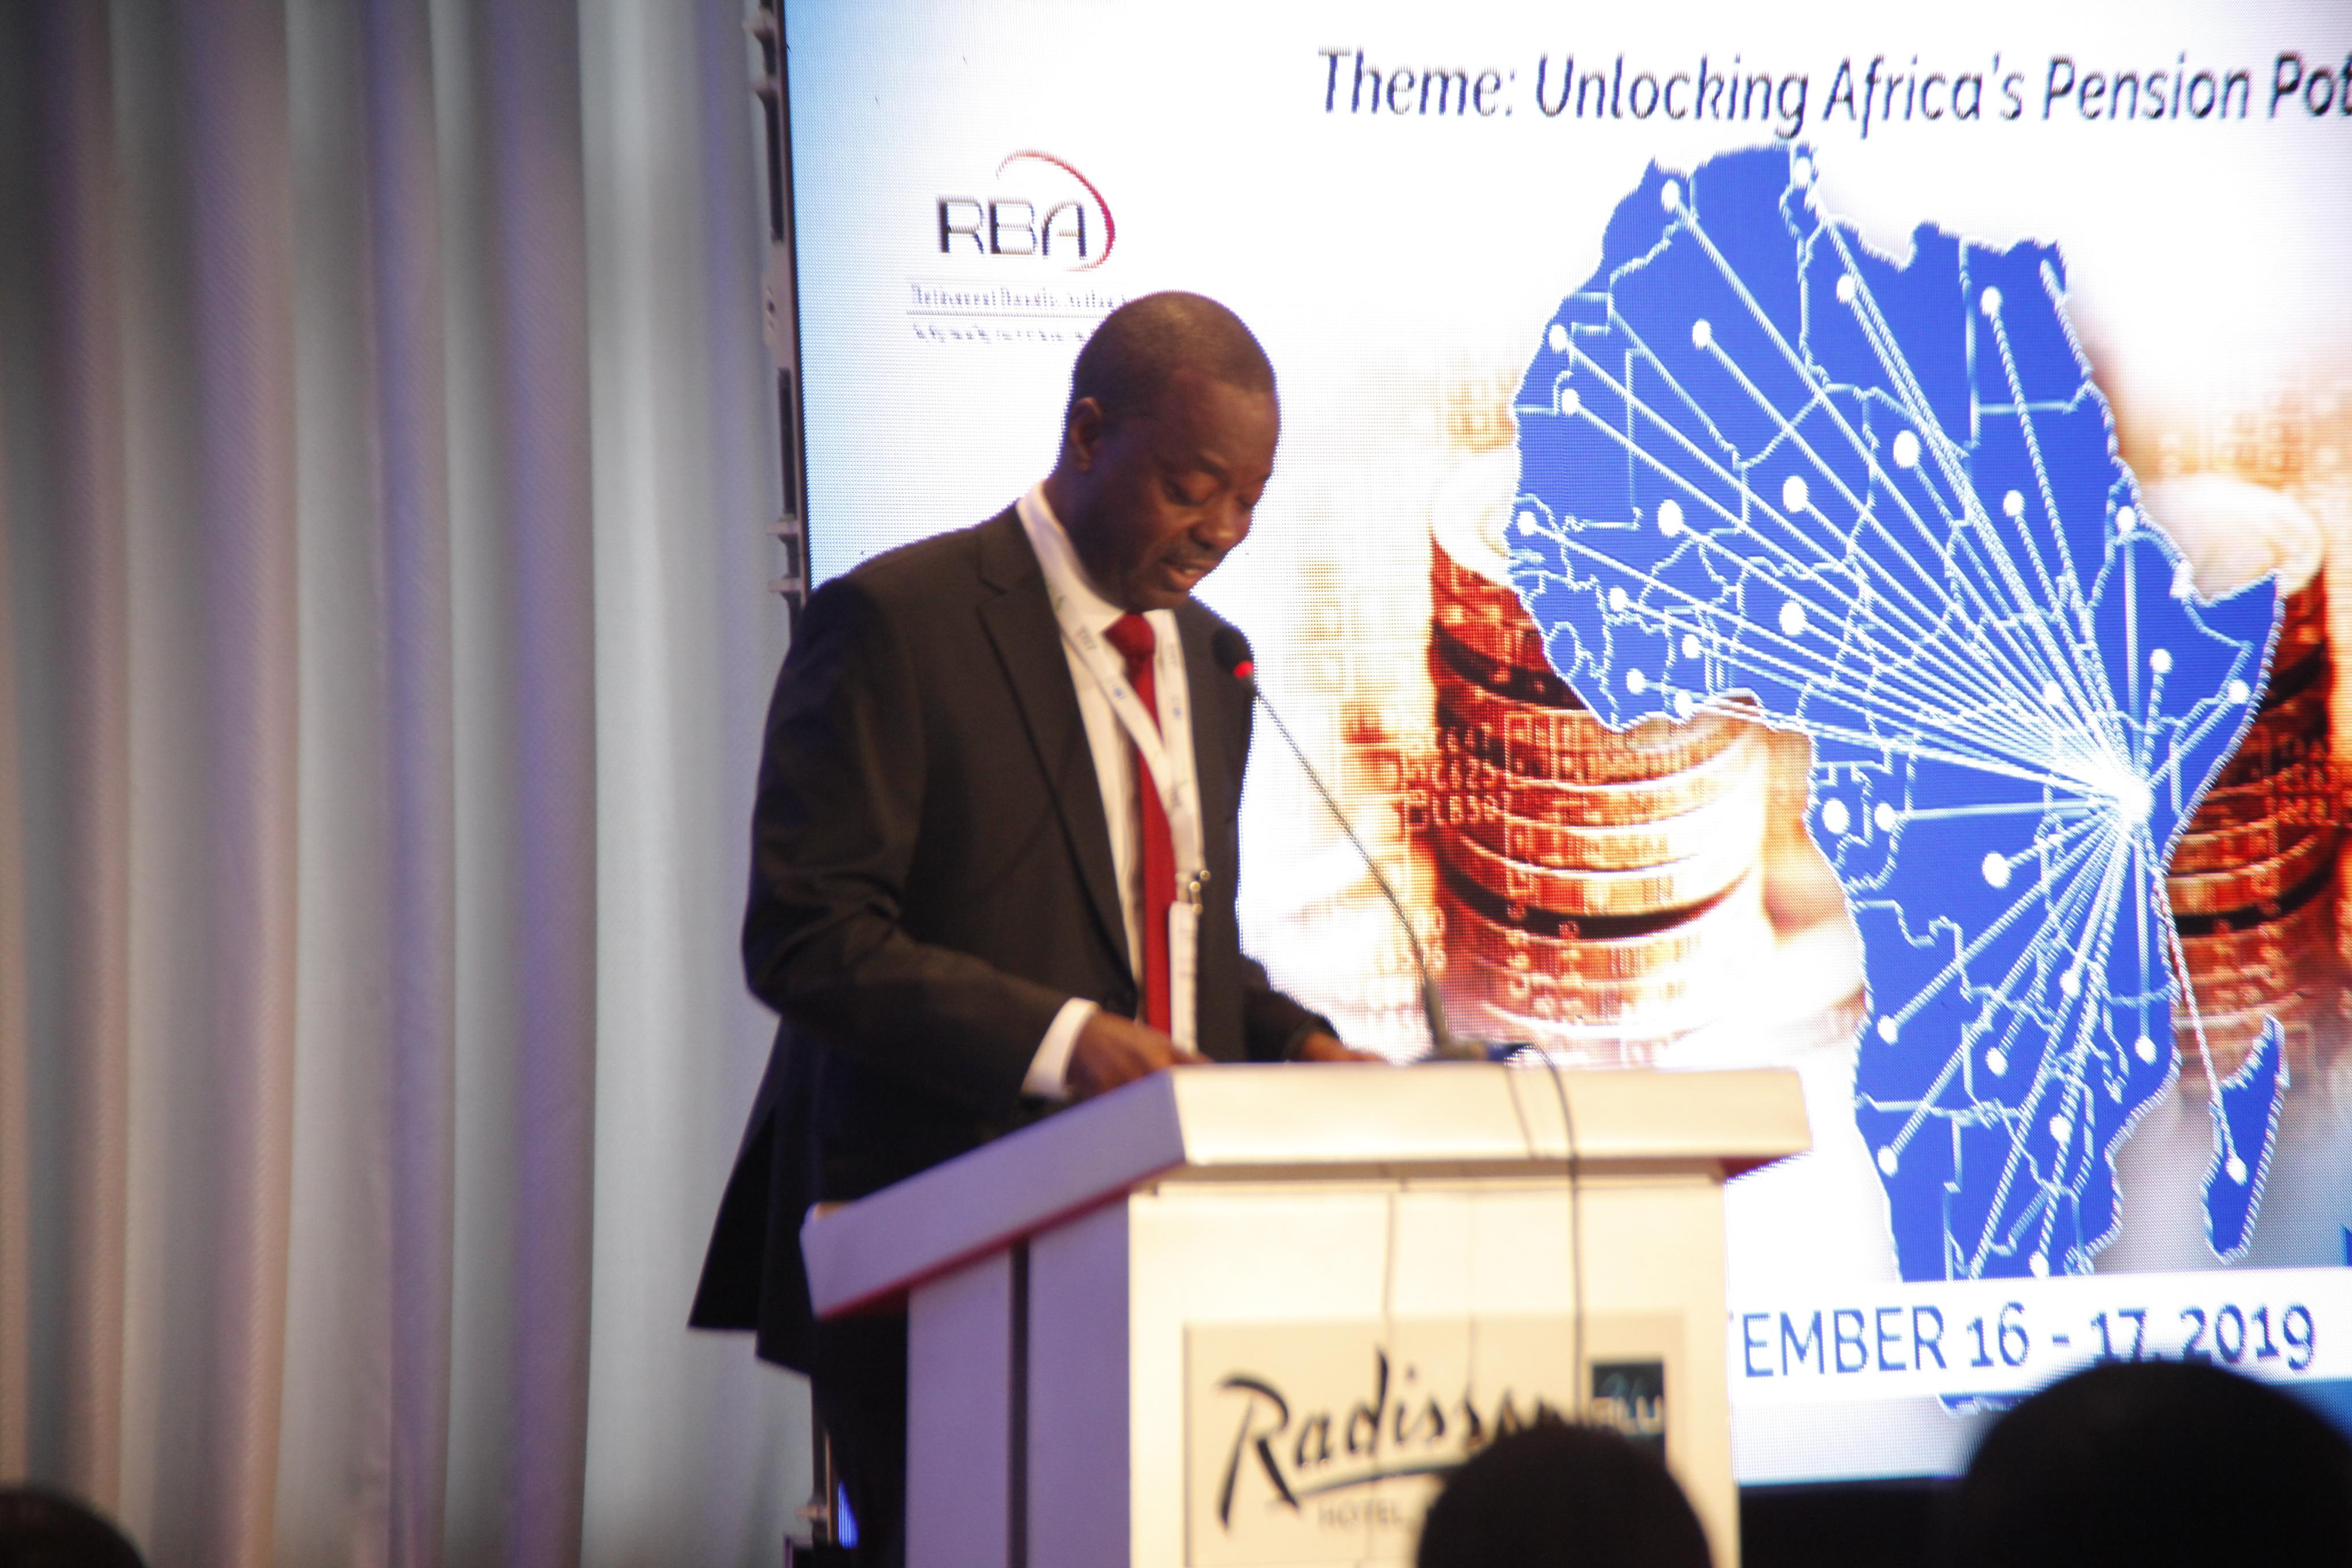 Kenya's pension regulator,  RBA, celebrates 20 years